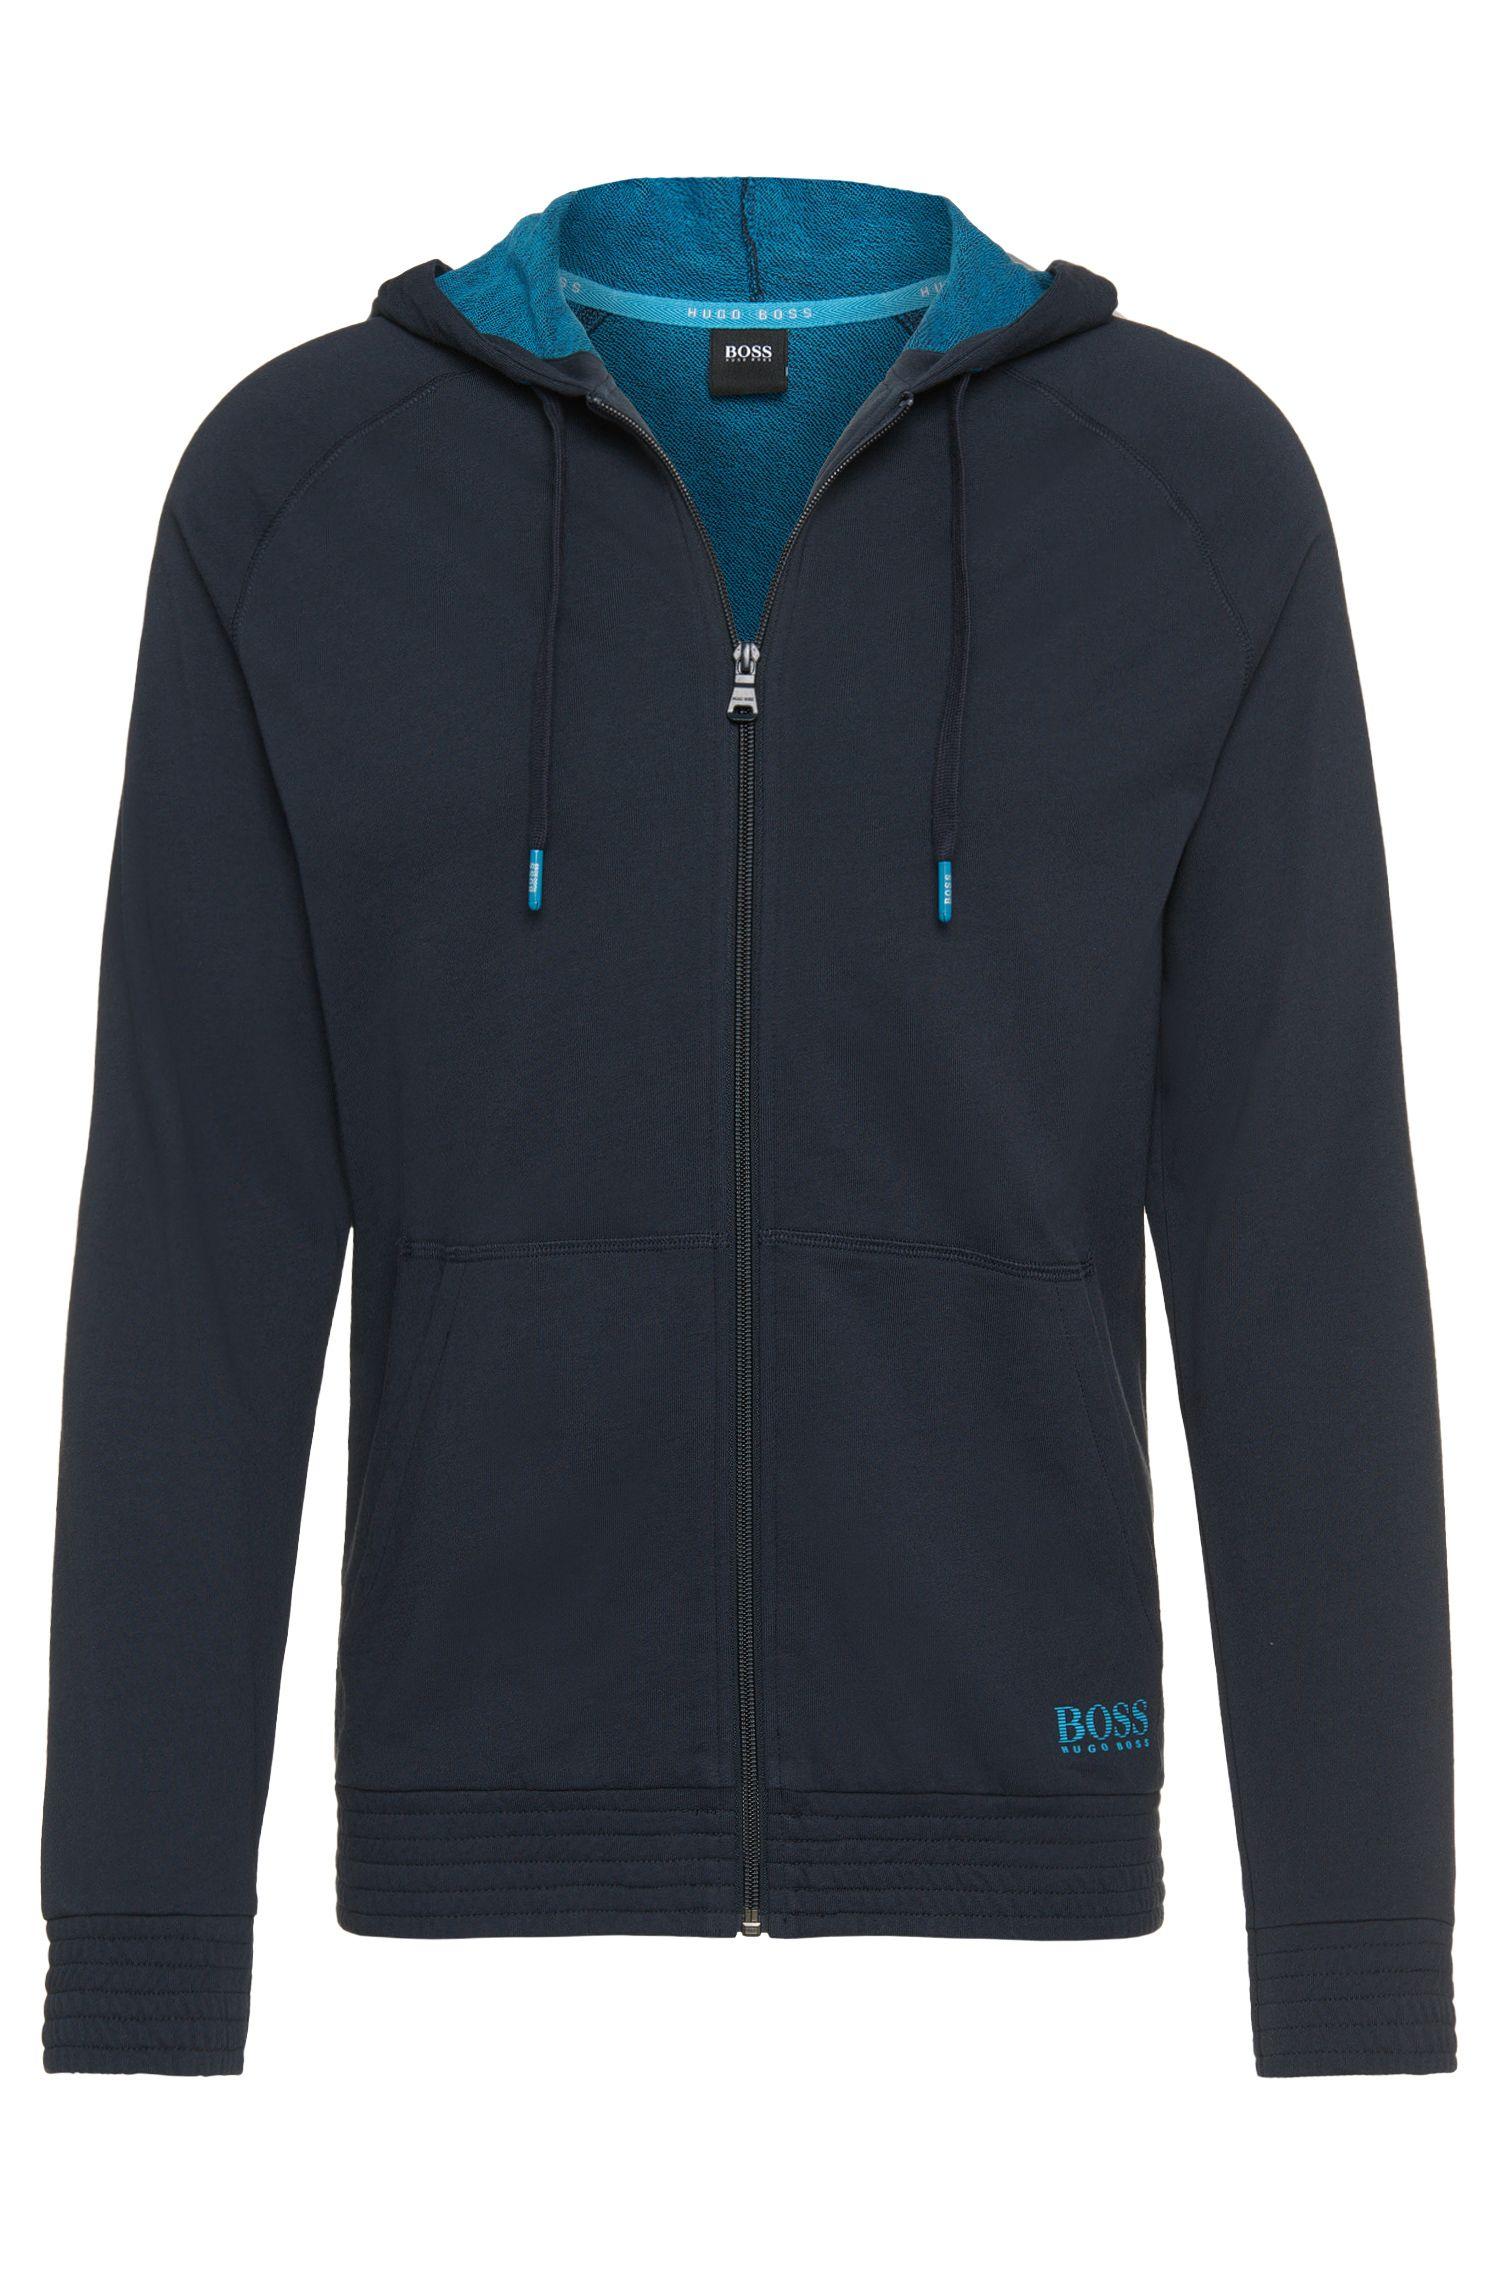 Sweatshirt-Jacke mit Kapuze aus reiner Baumwolle: 'Jacket Hooded'